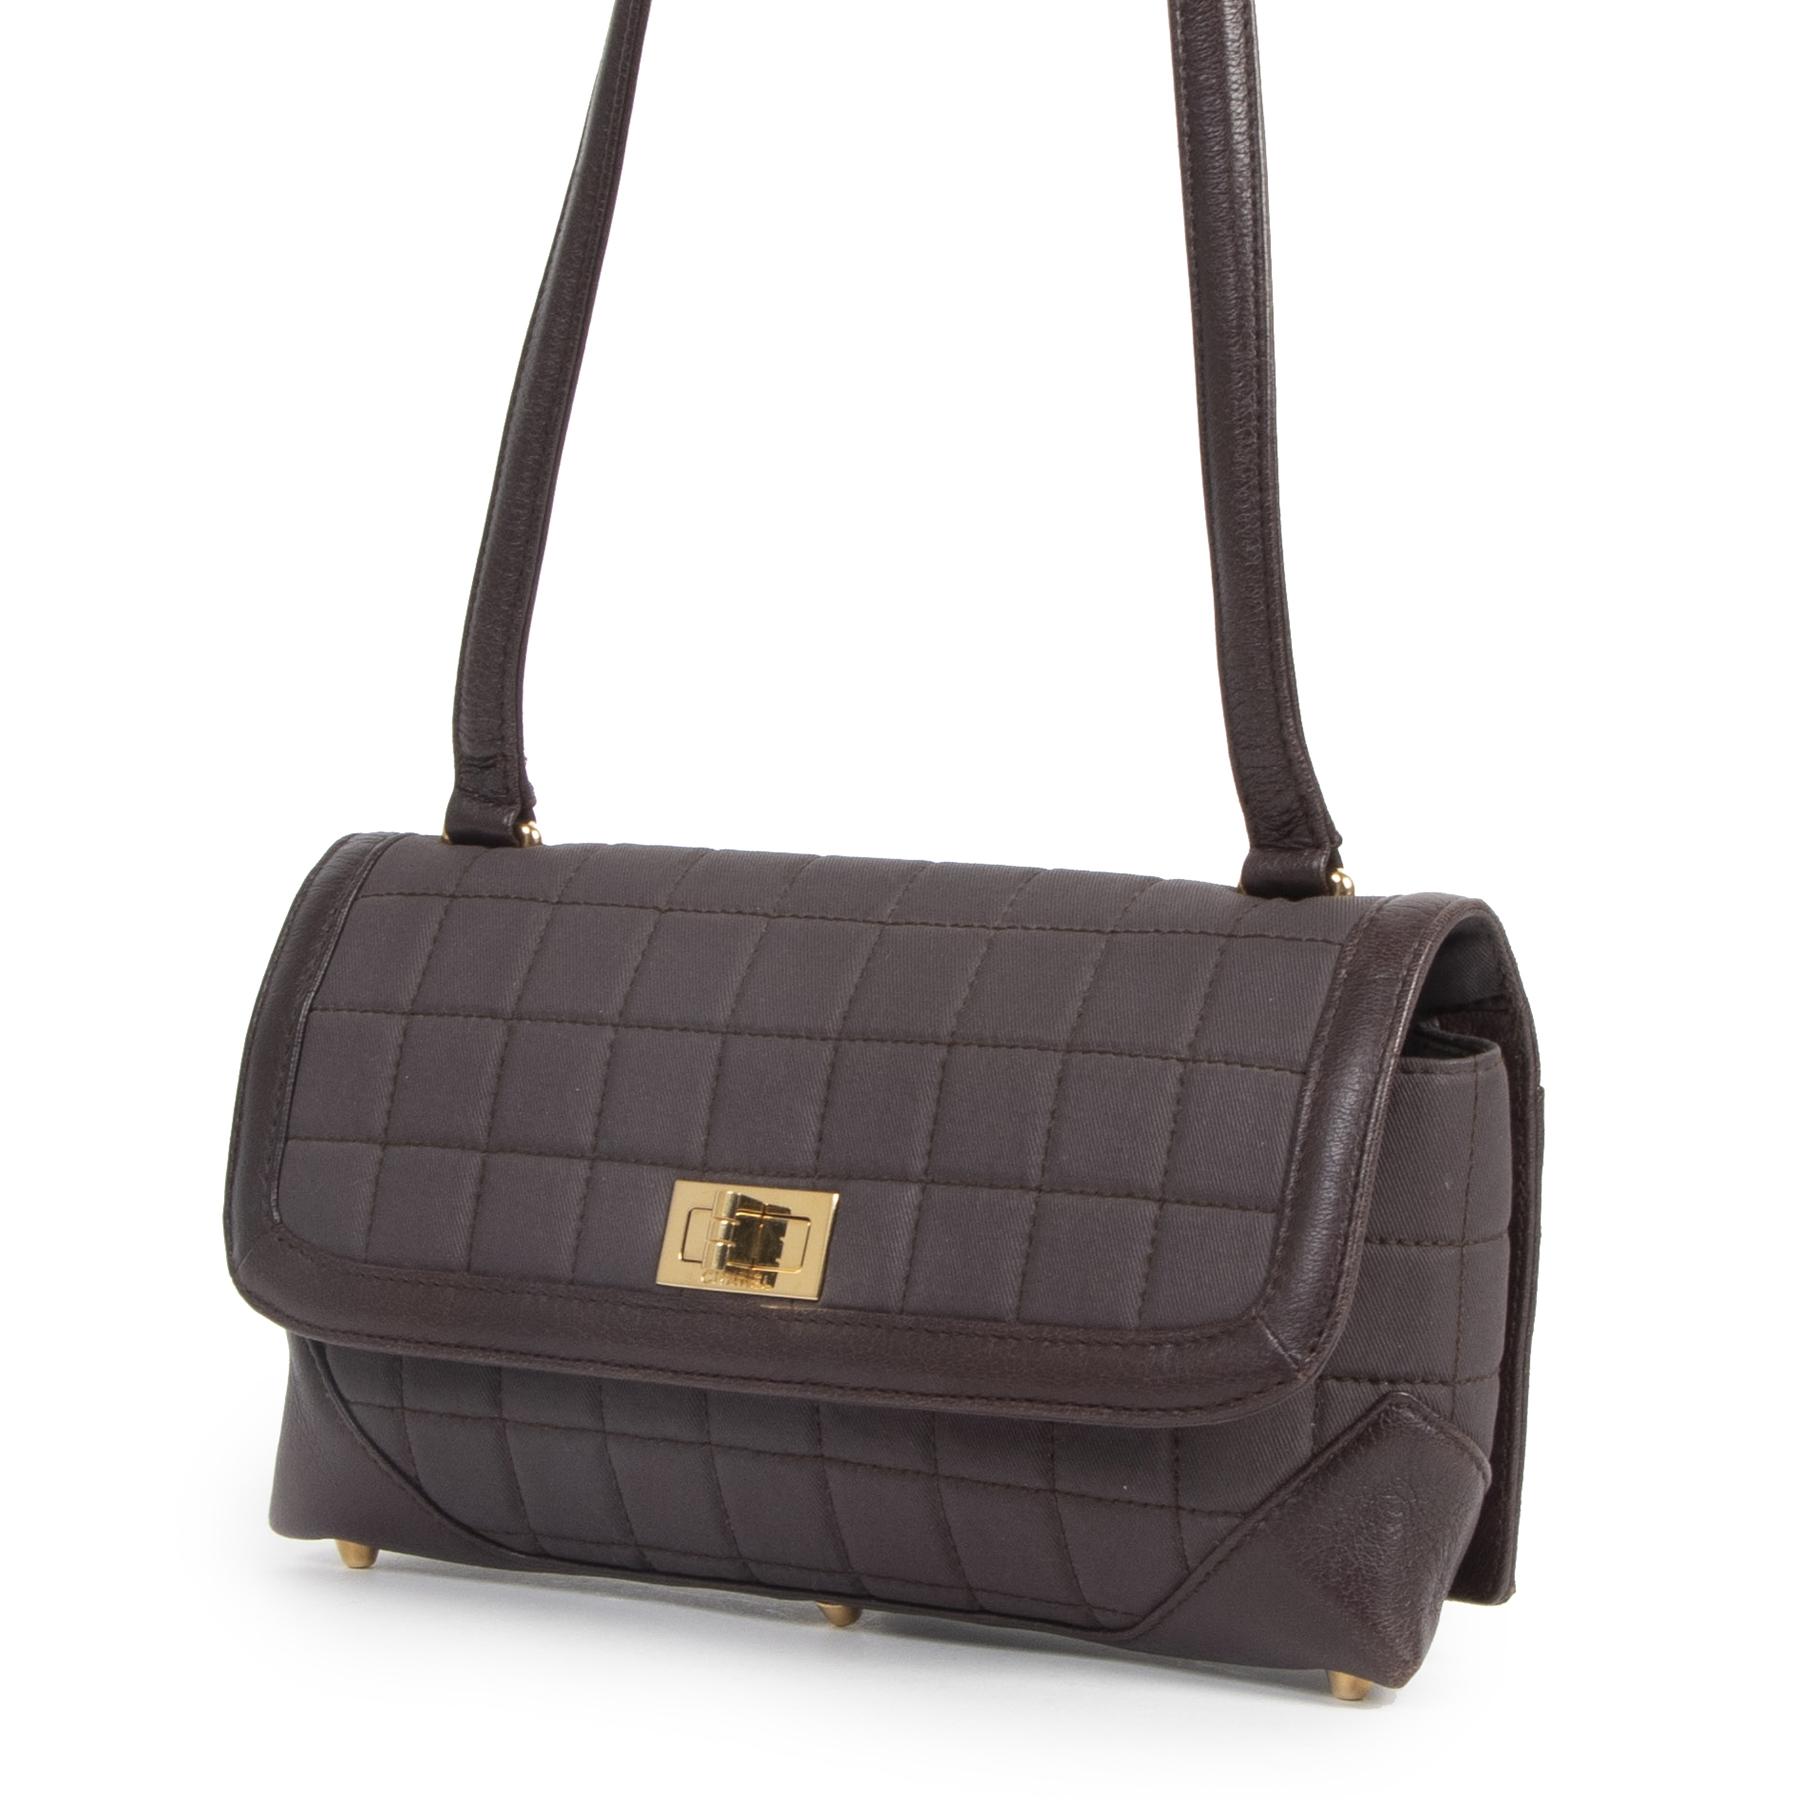 Authentic secondhand Chanel East West Reissue Dark Plum Canvas Shoulder Bag designer bags luxury vintage webshop fashion safe secure online shopping